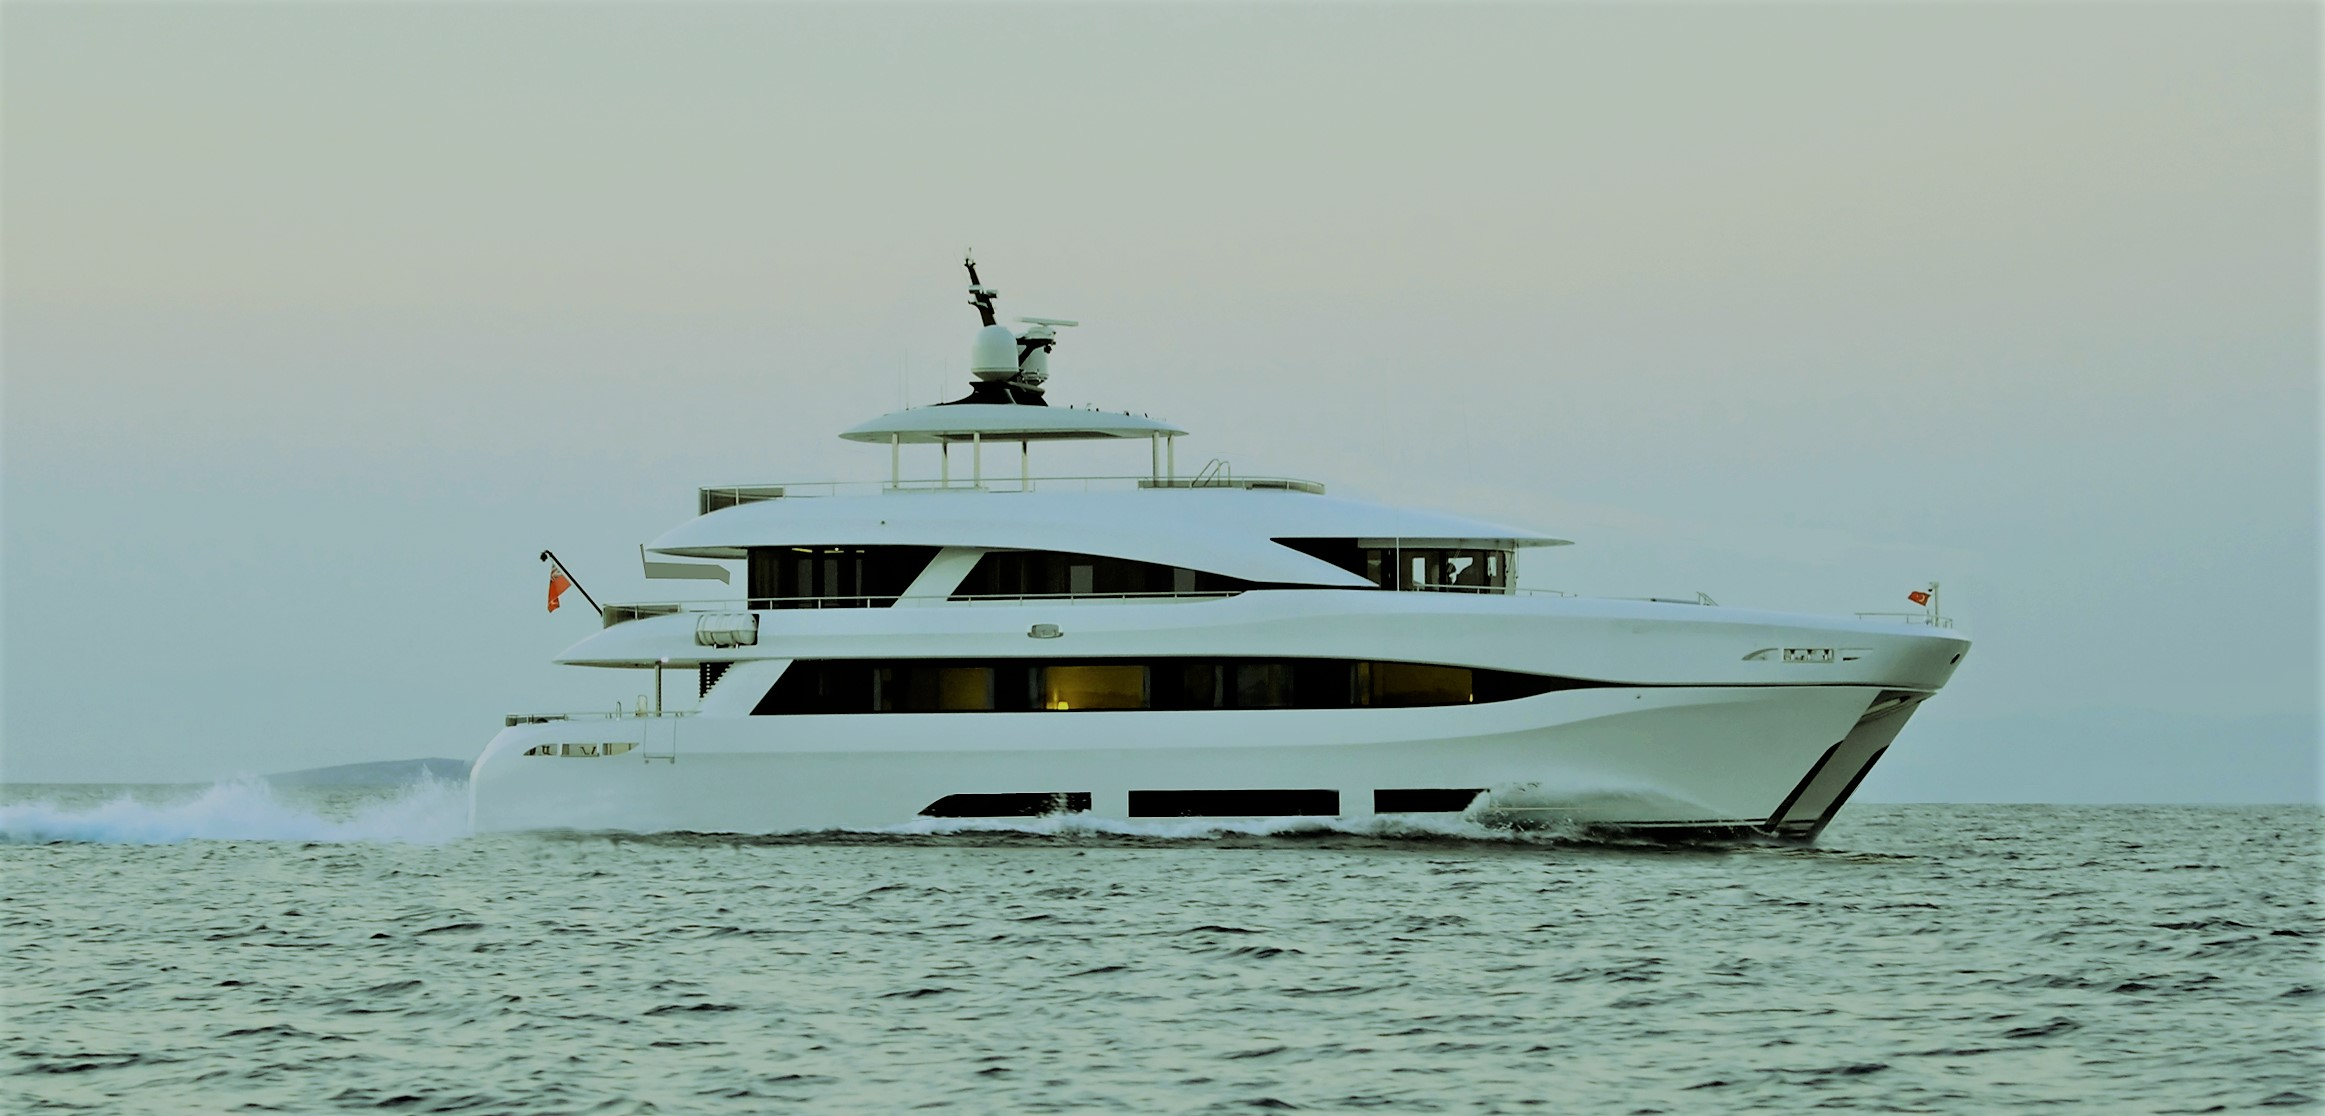 Yacht QUARANTA By Curvelle - Profile Underway